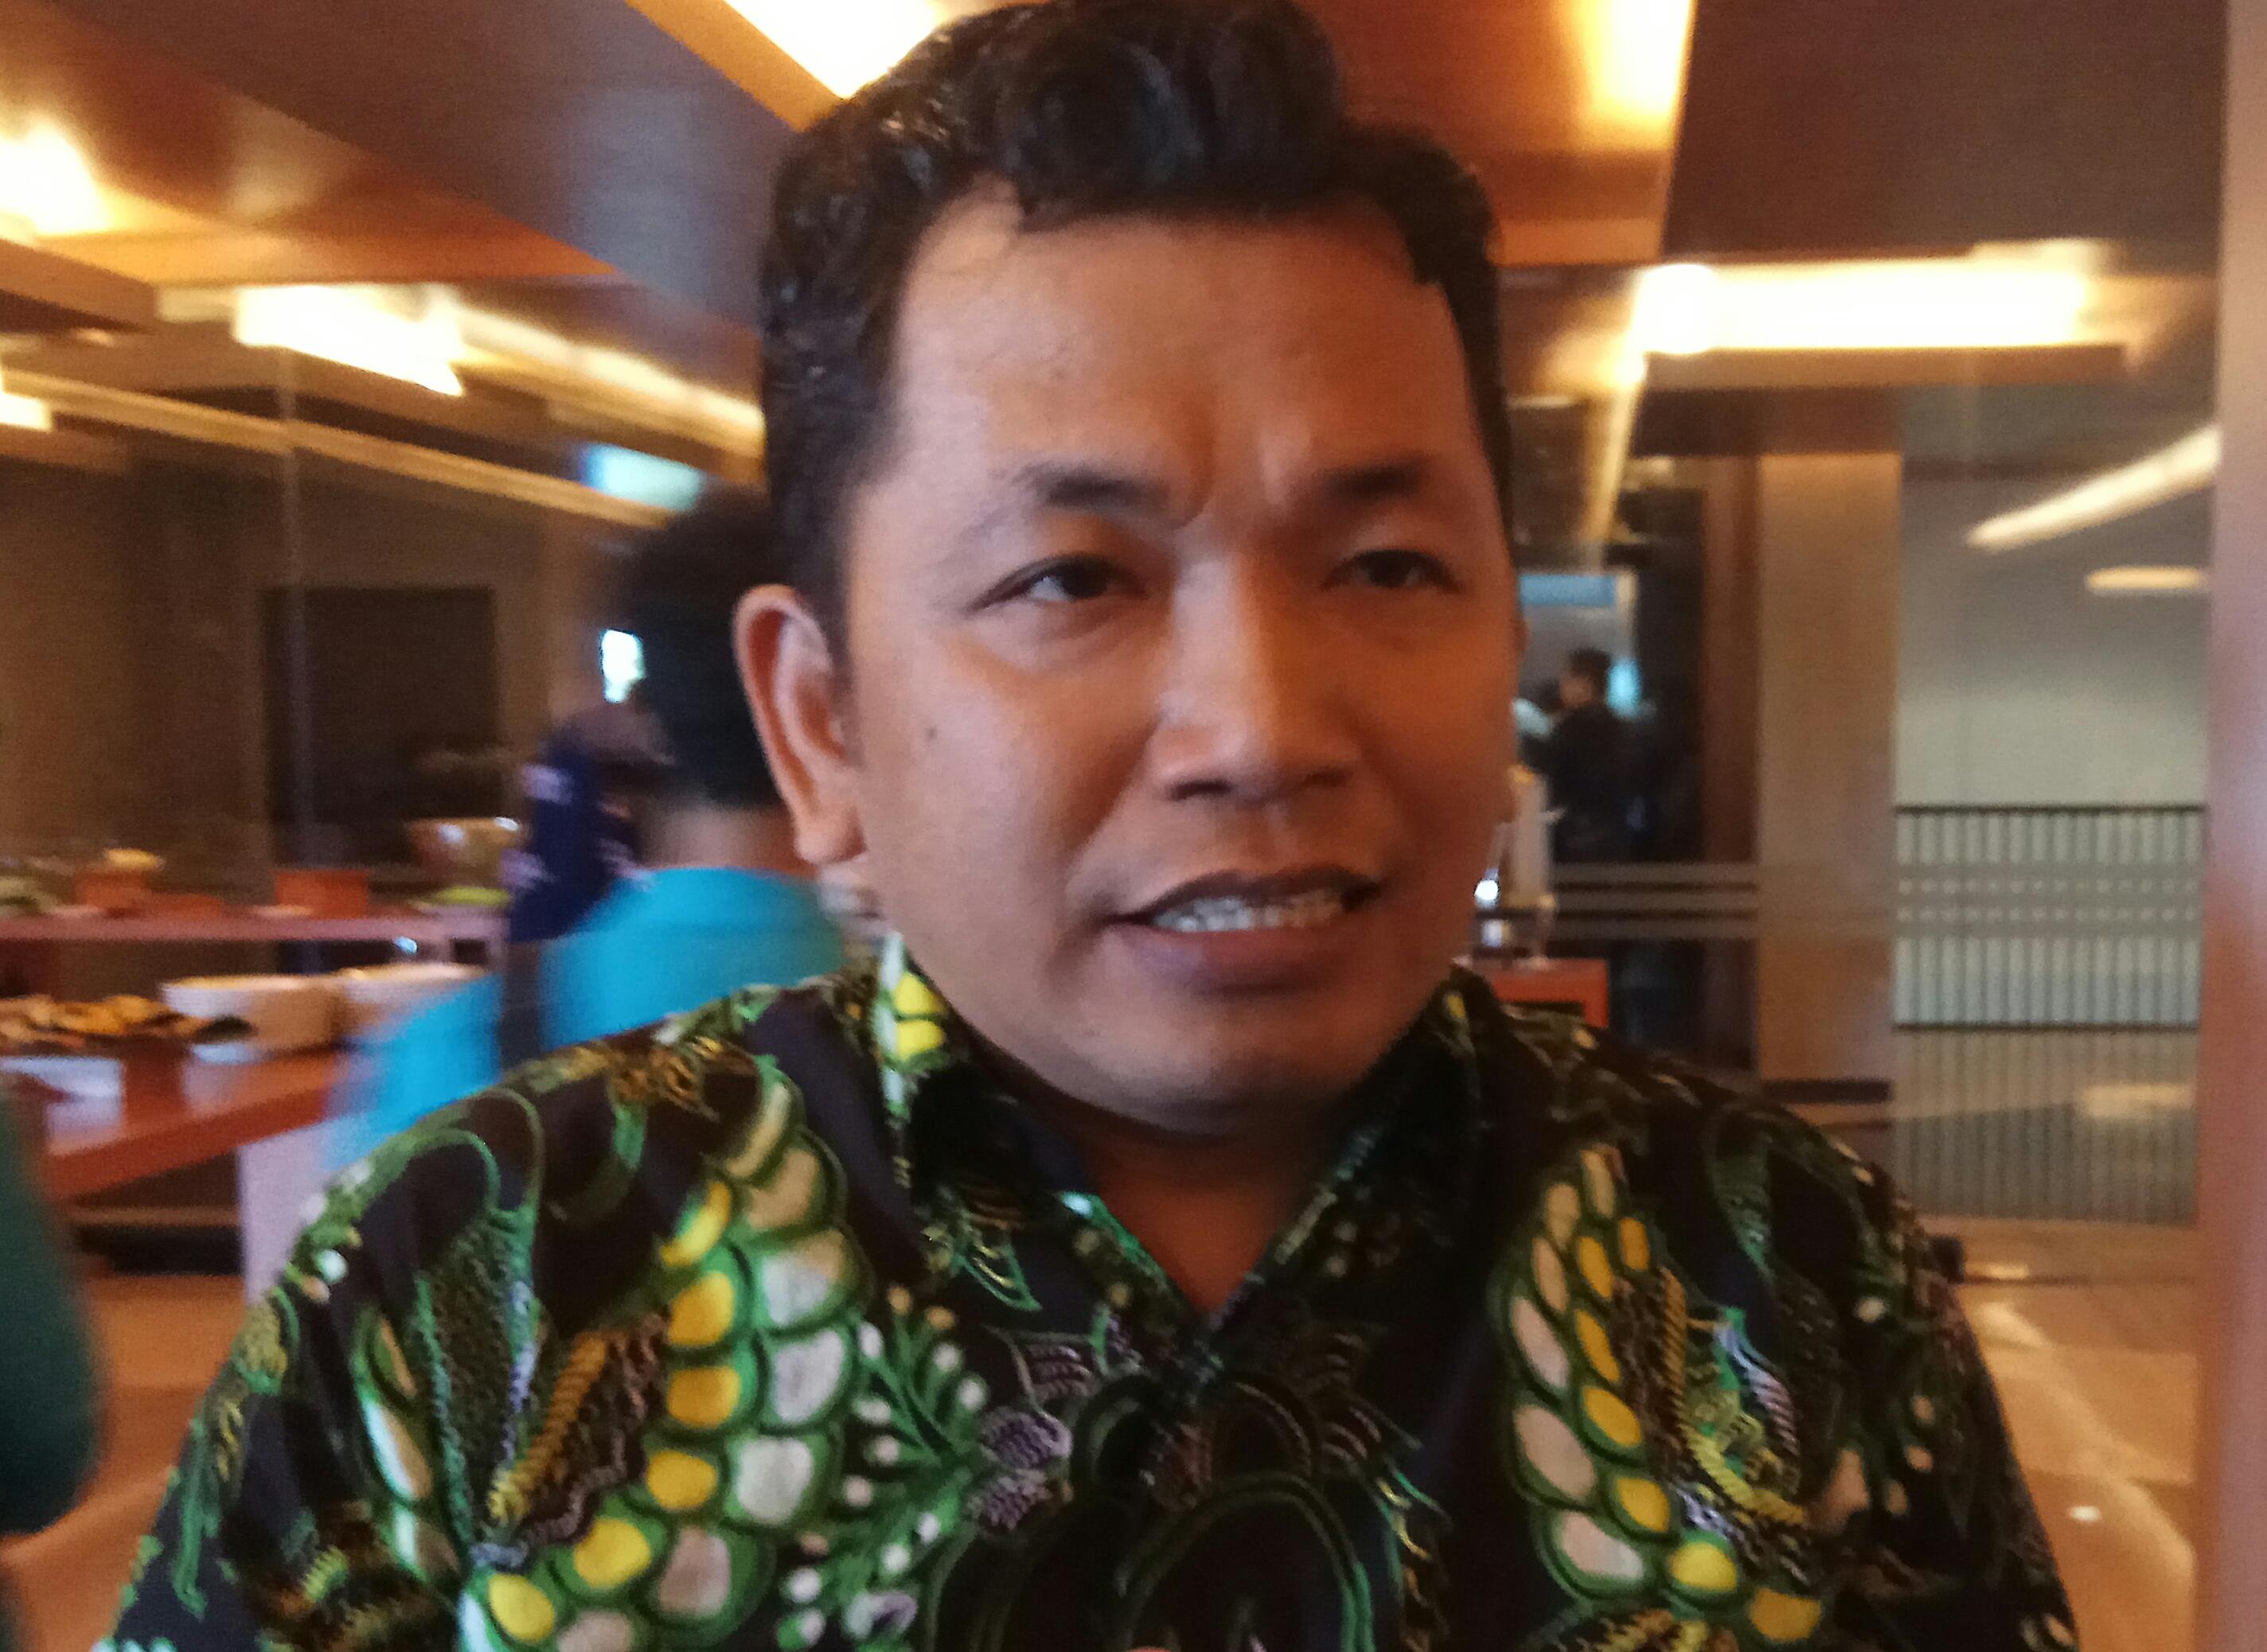 Komisioner Bawaslu Banyuwangi, Hasyim Wahid